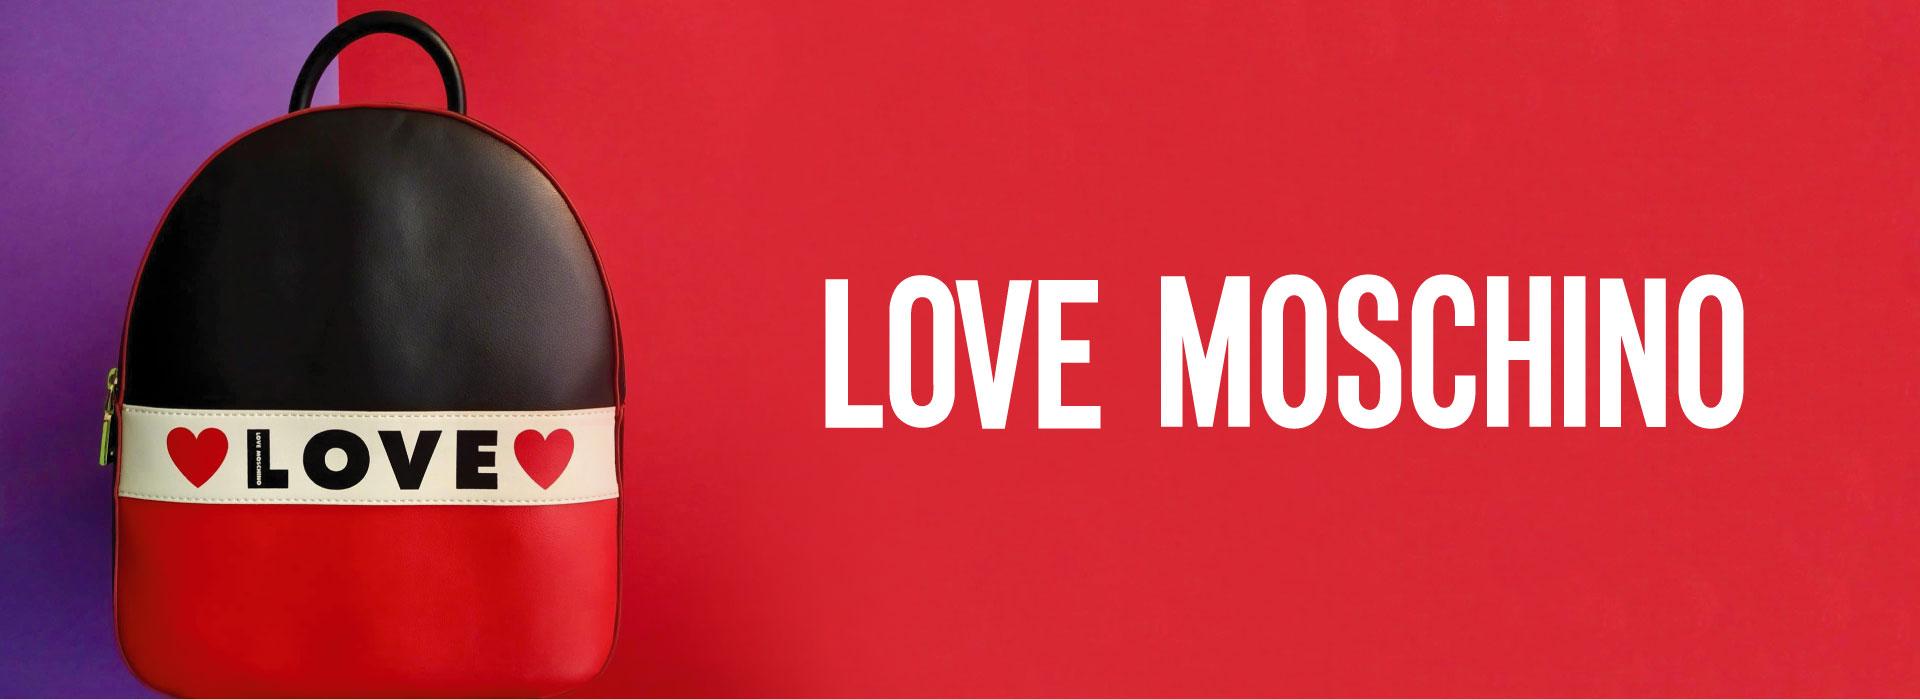 Love Moschino (APPROVATO)